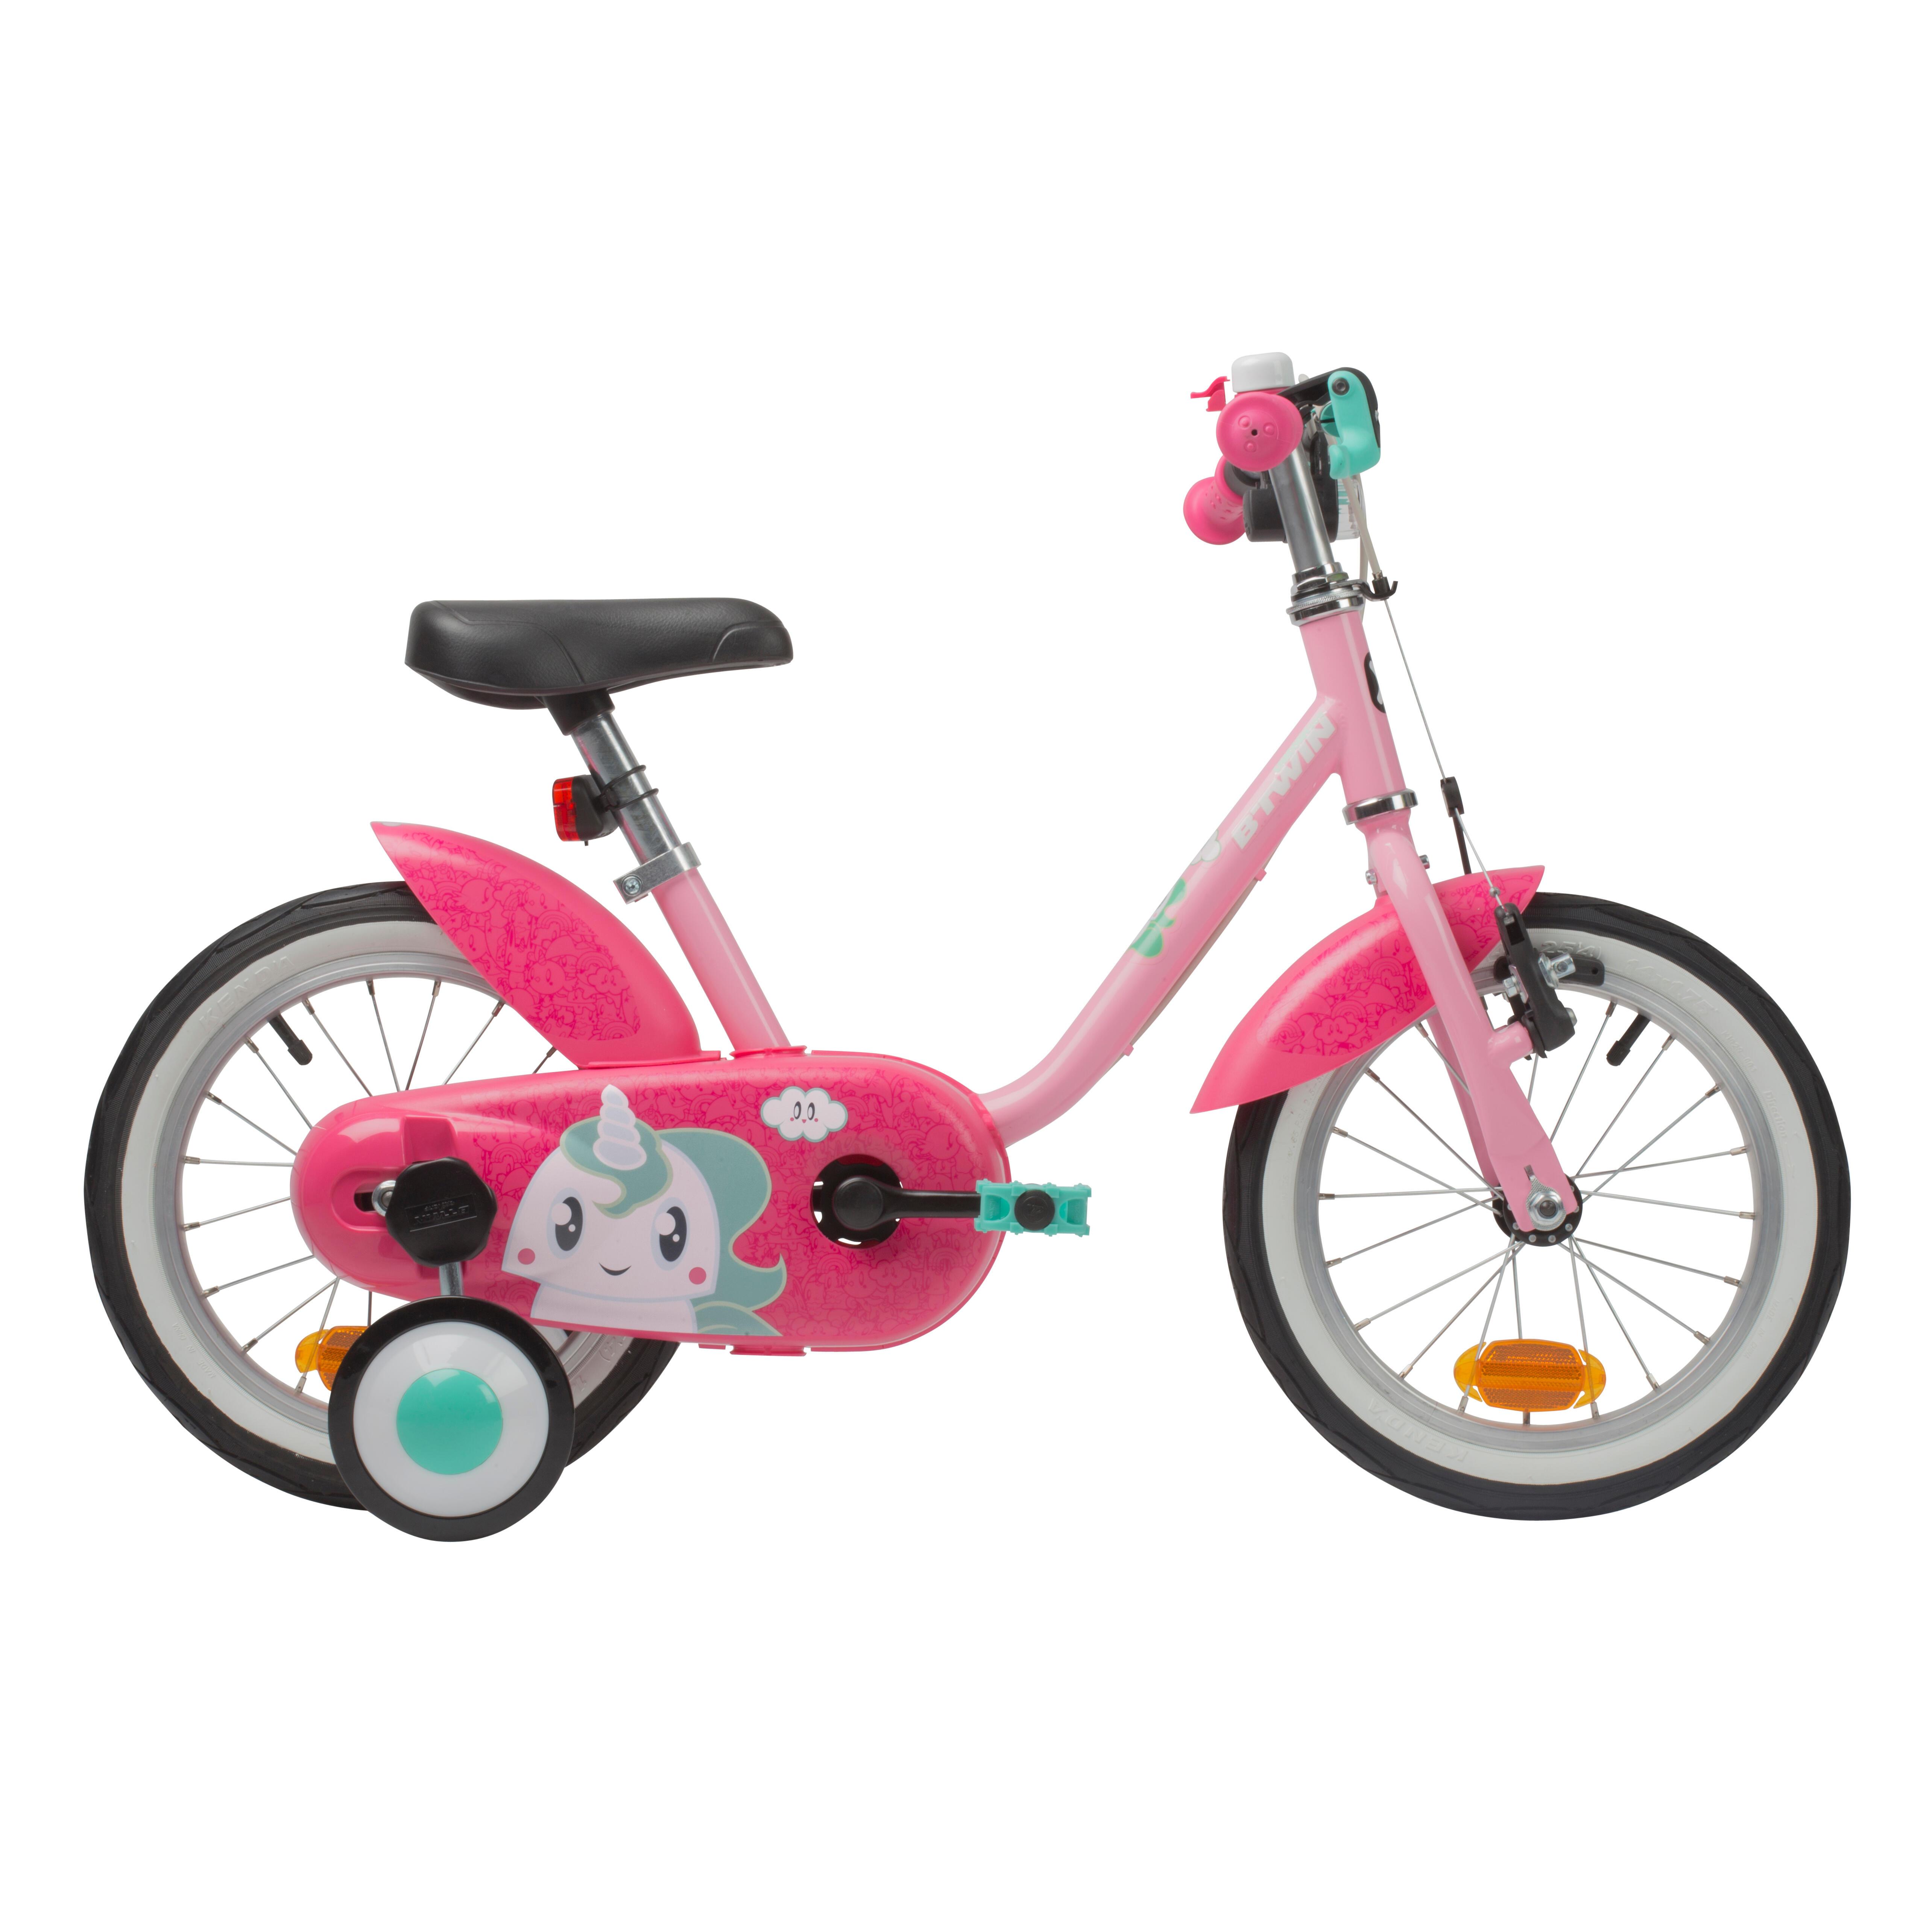 cbf20272f2c05 Vélos enfant | Decathlon